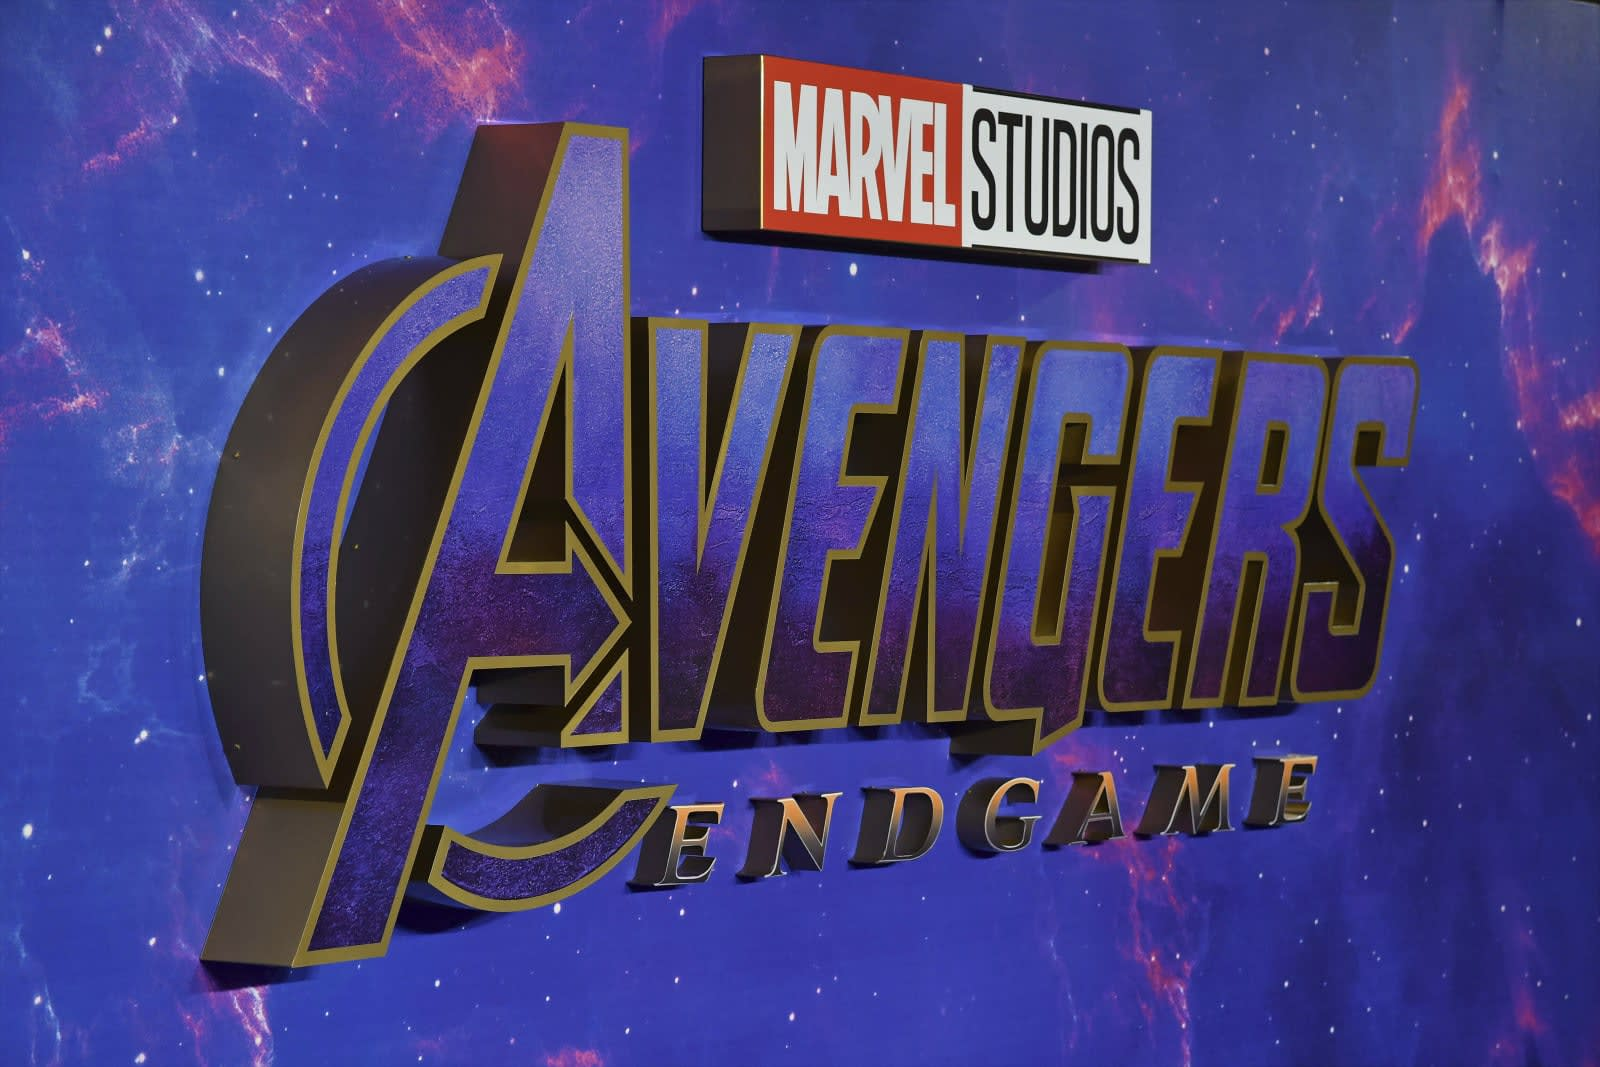 Avengers: Endgame' footage leaks on Reddit, YouTube and Twitter